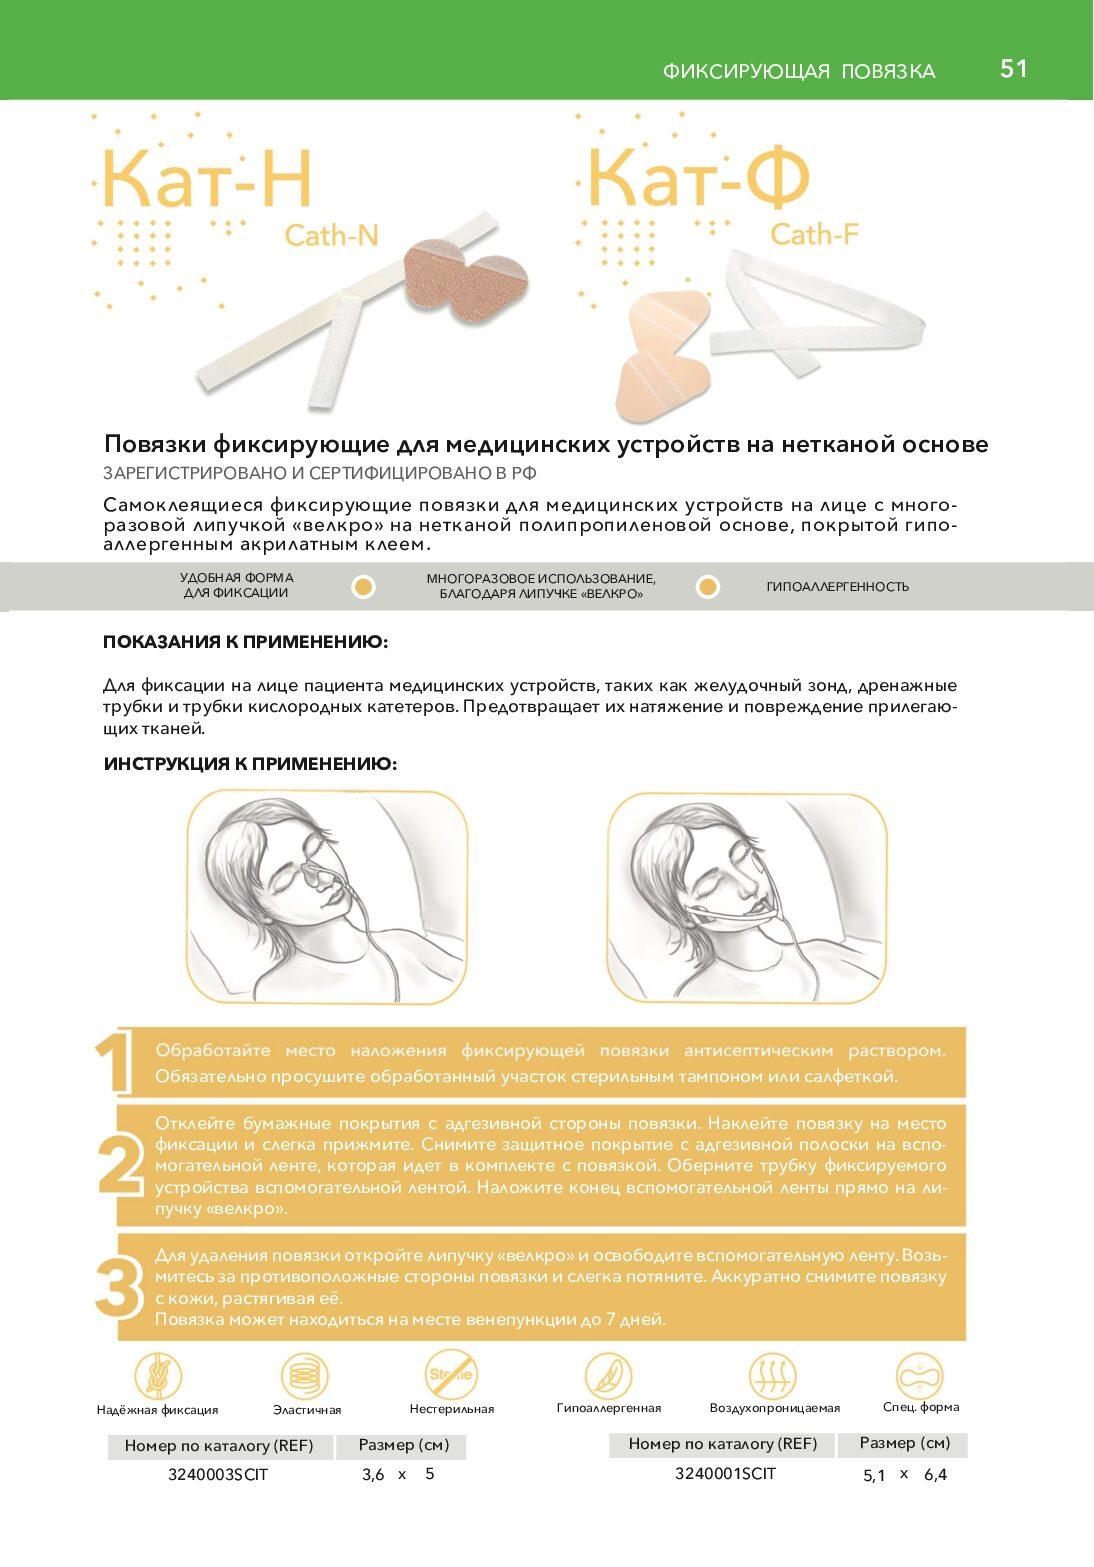 продукции Optimelle2 1 60 51 pdf